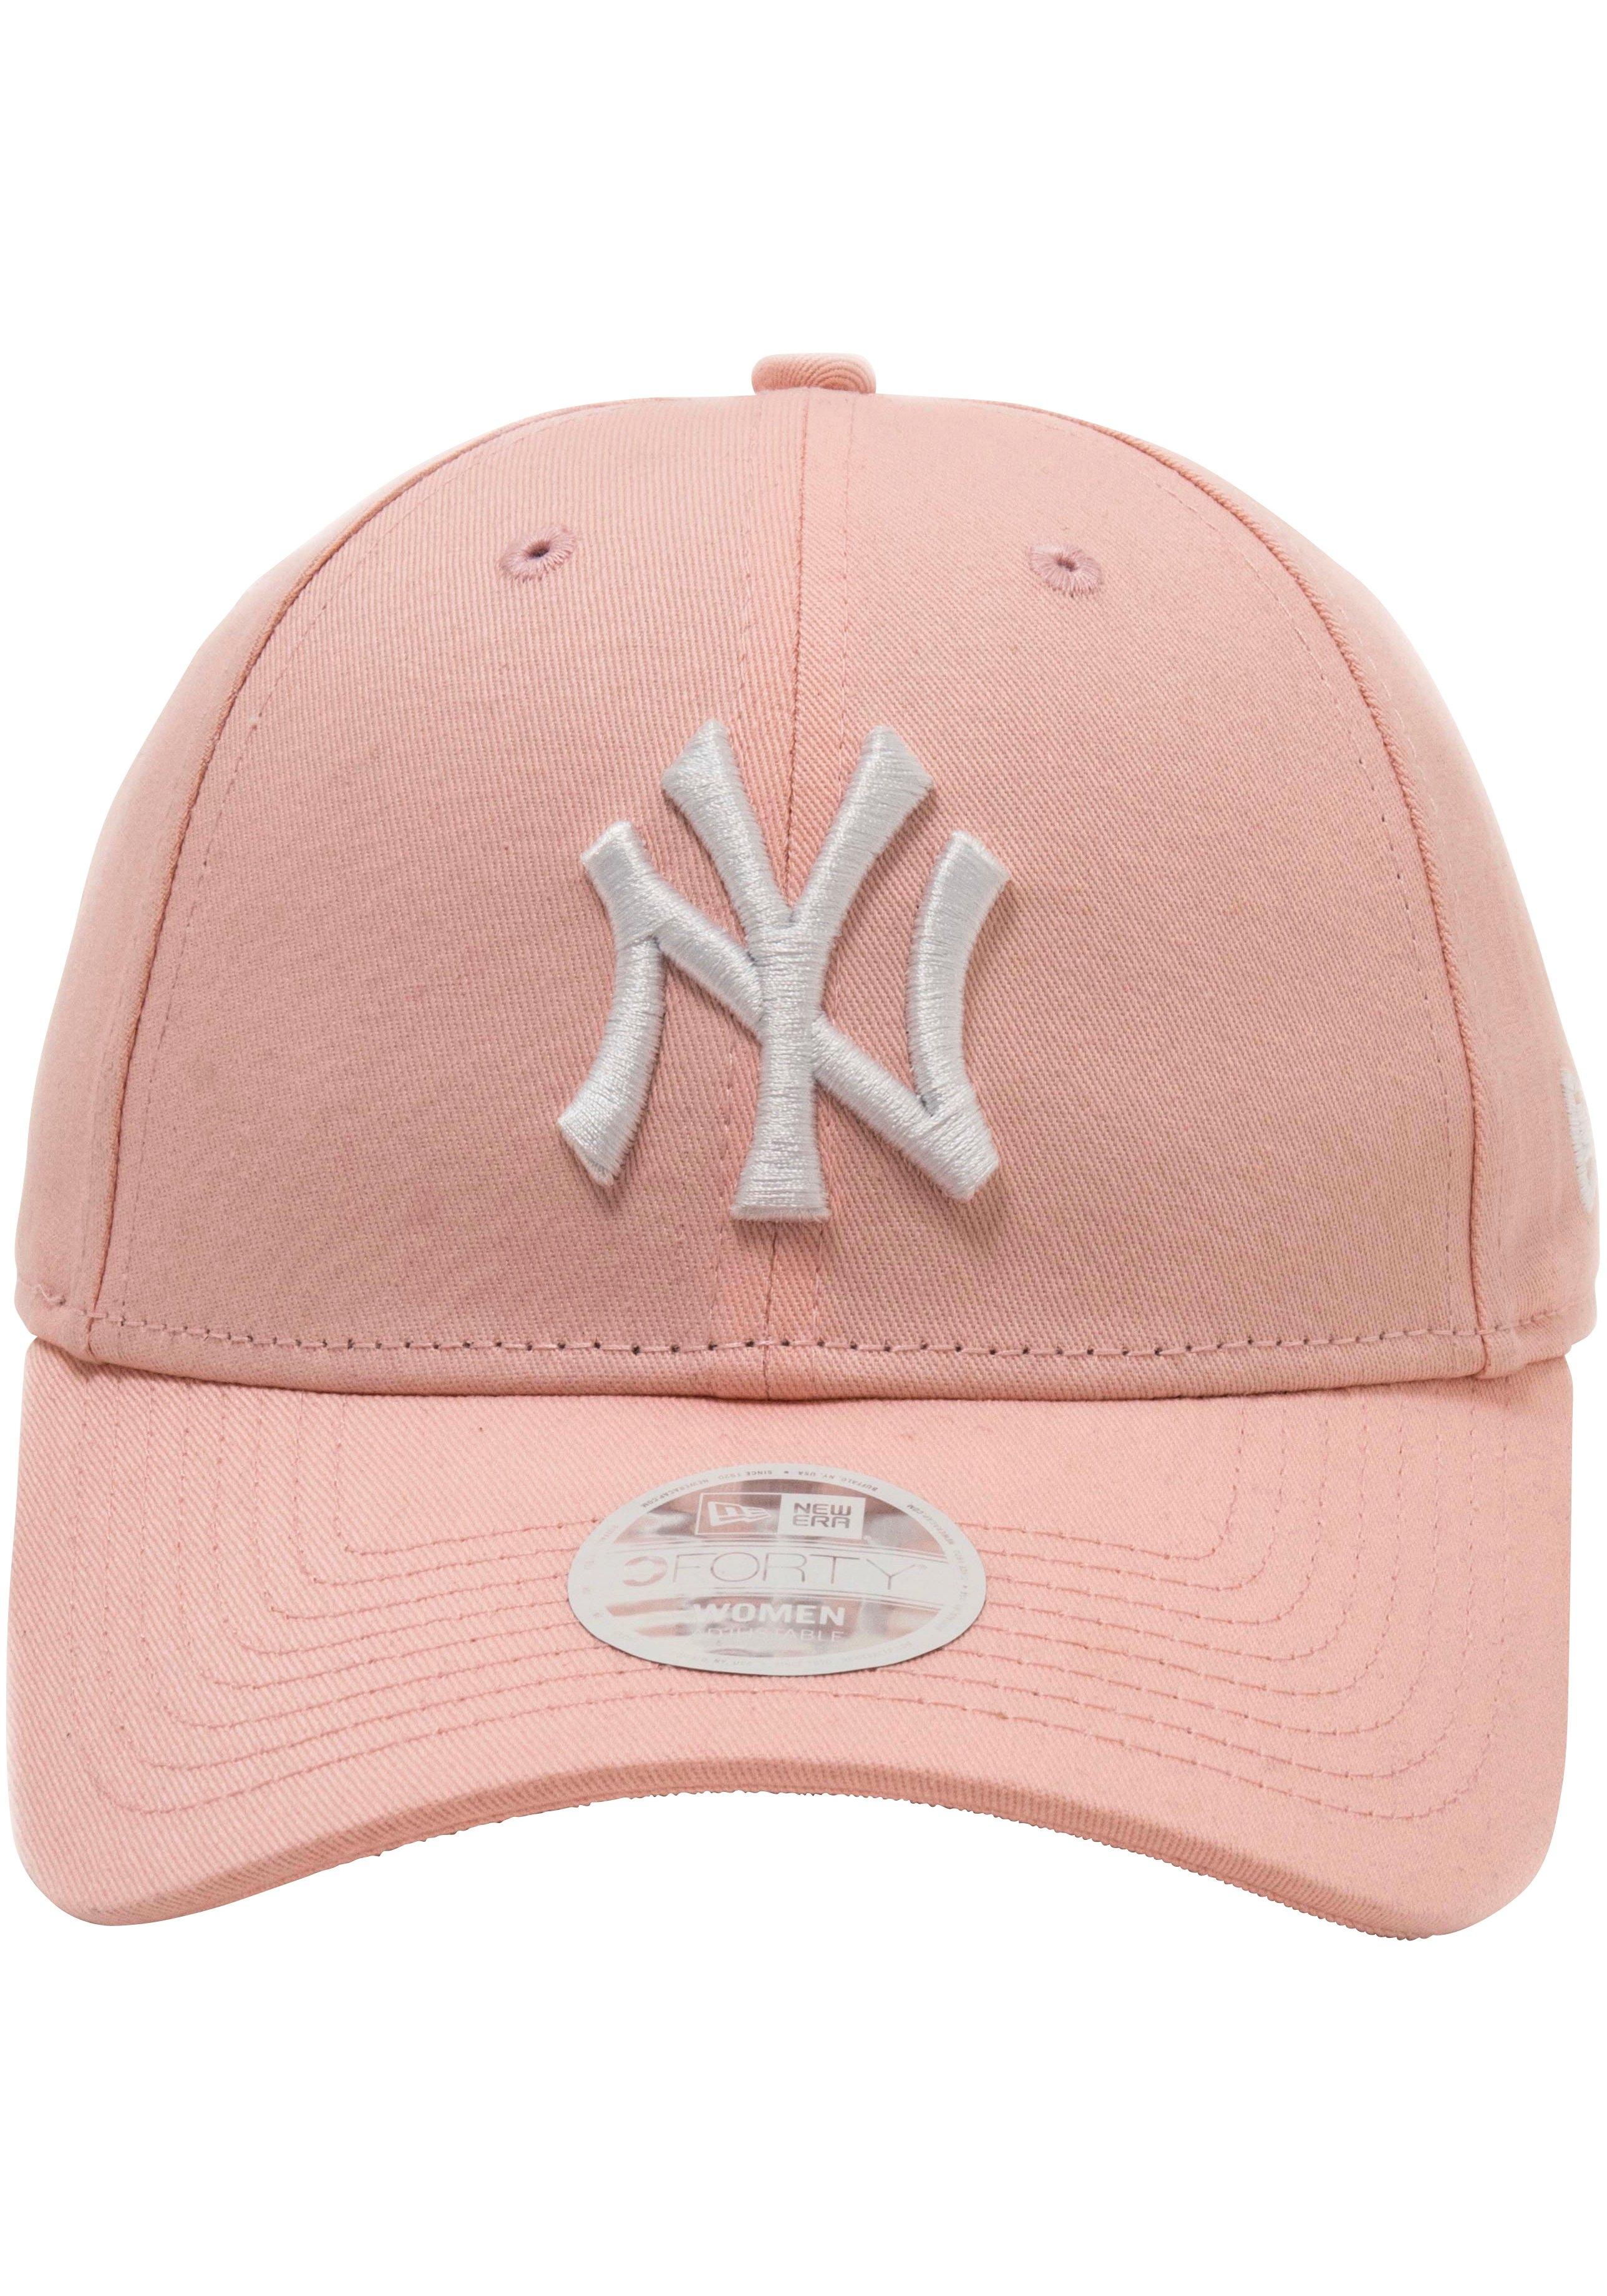 New Era baseballcap »NEW YORK YANKEES« goedkoop op otto.nl kopen